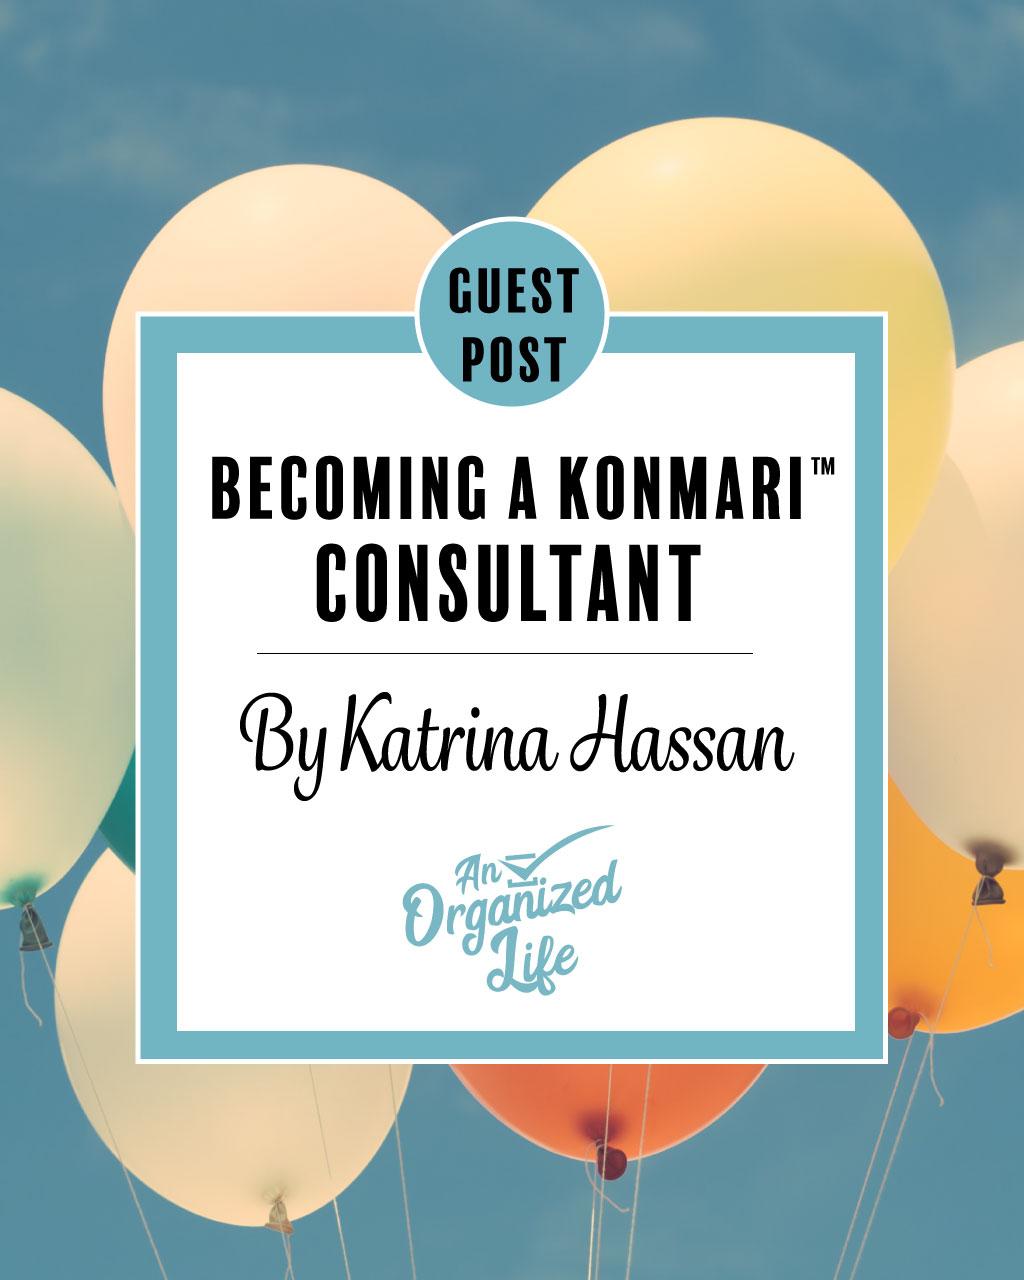 Becoming a KonMari Consultant